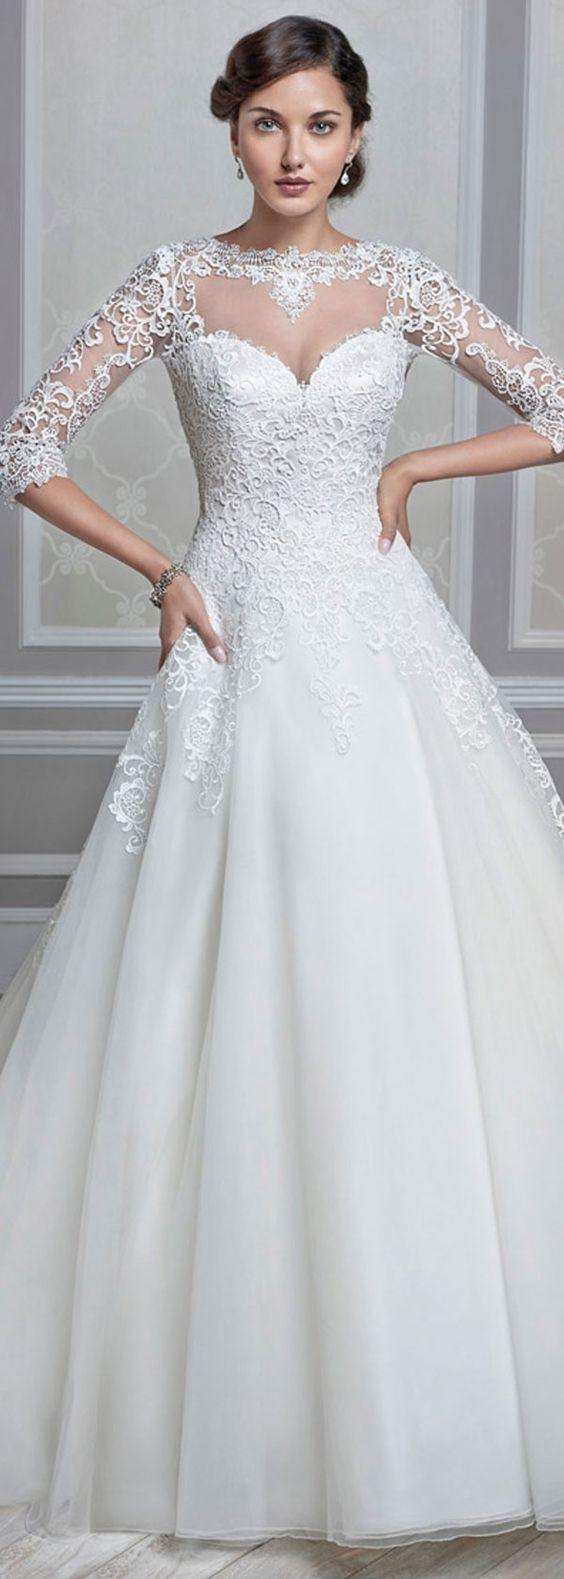 Bellas wedding dress   best images about Wedding Dresses on Pinterest  Stella york